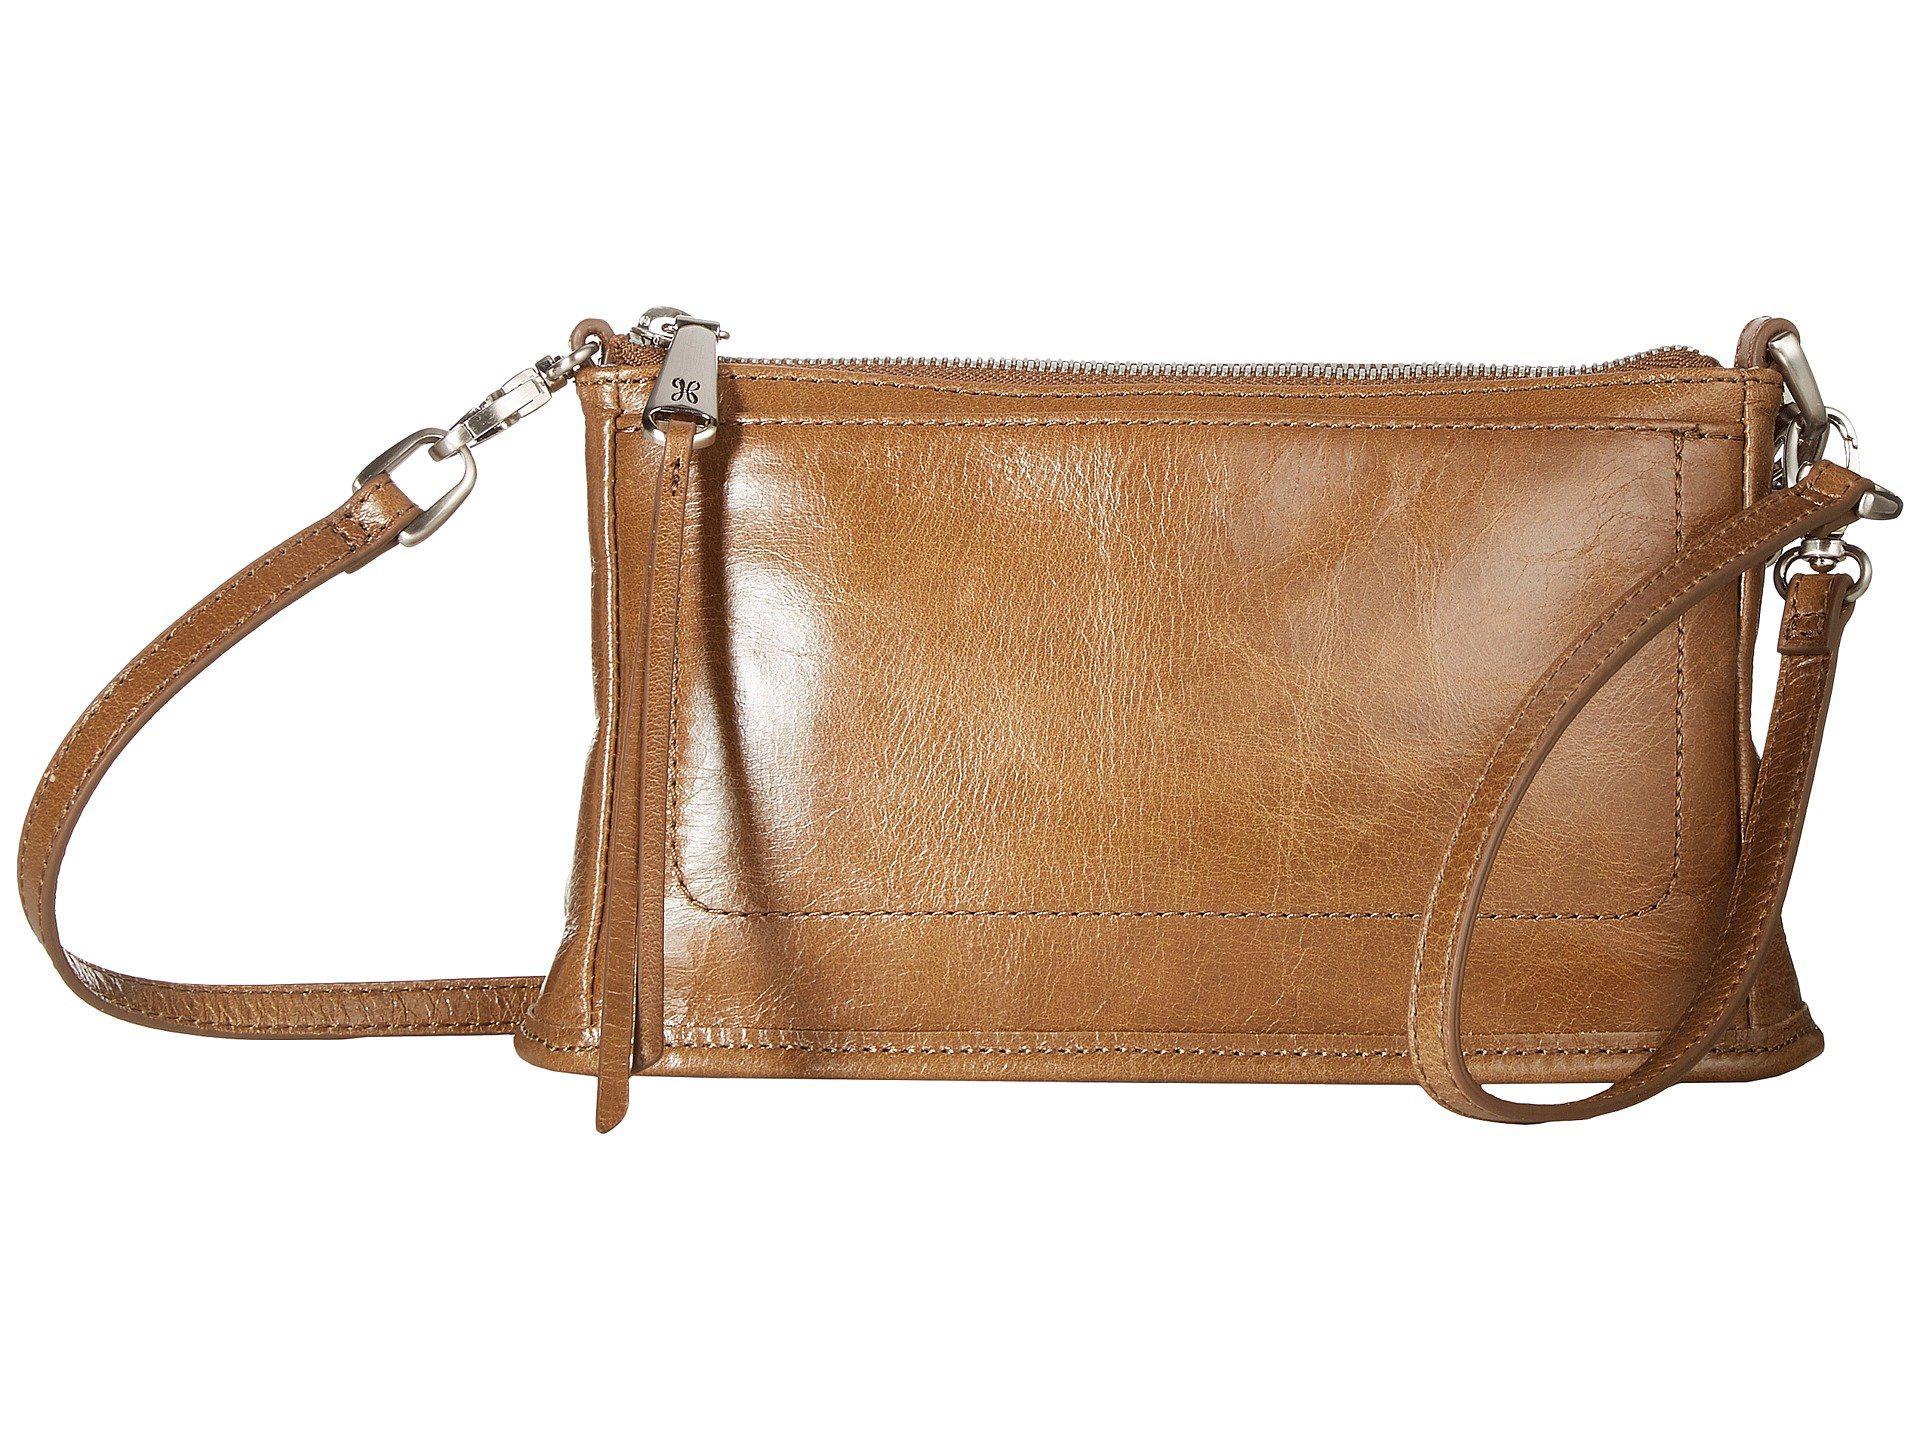 a8da59bd65 Lyst - Hobo Cadence (mink) Cross Body Handbags in Brown - Save 46%